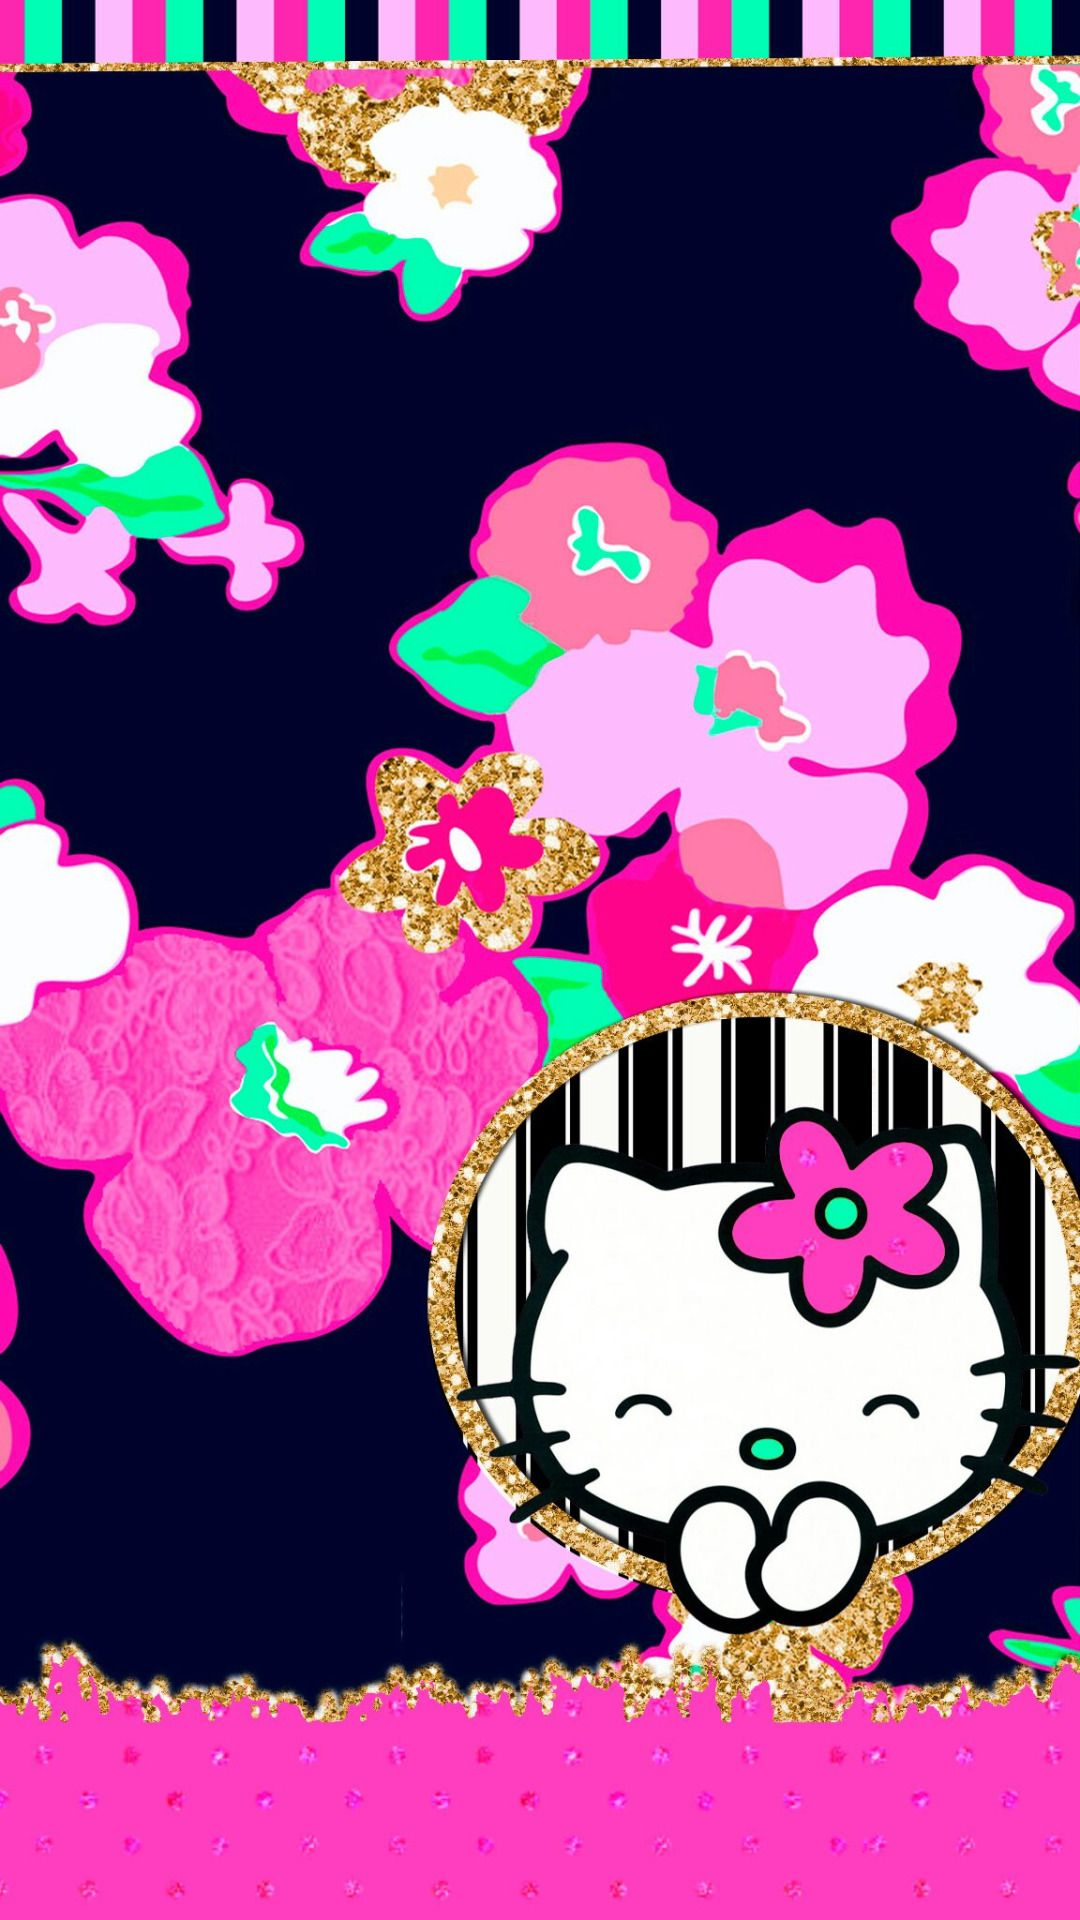 Fantastic Wallpaper Hello Kitty Floral - 14020b590419e3372618cd1186ed7ac2  Picture_856276.jpg